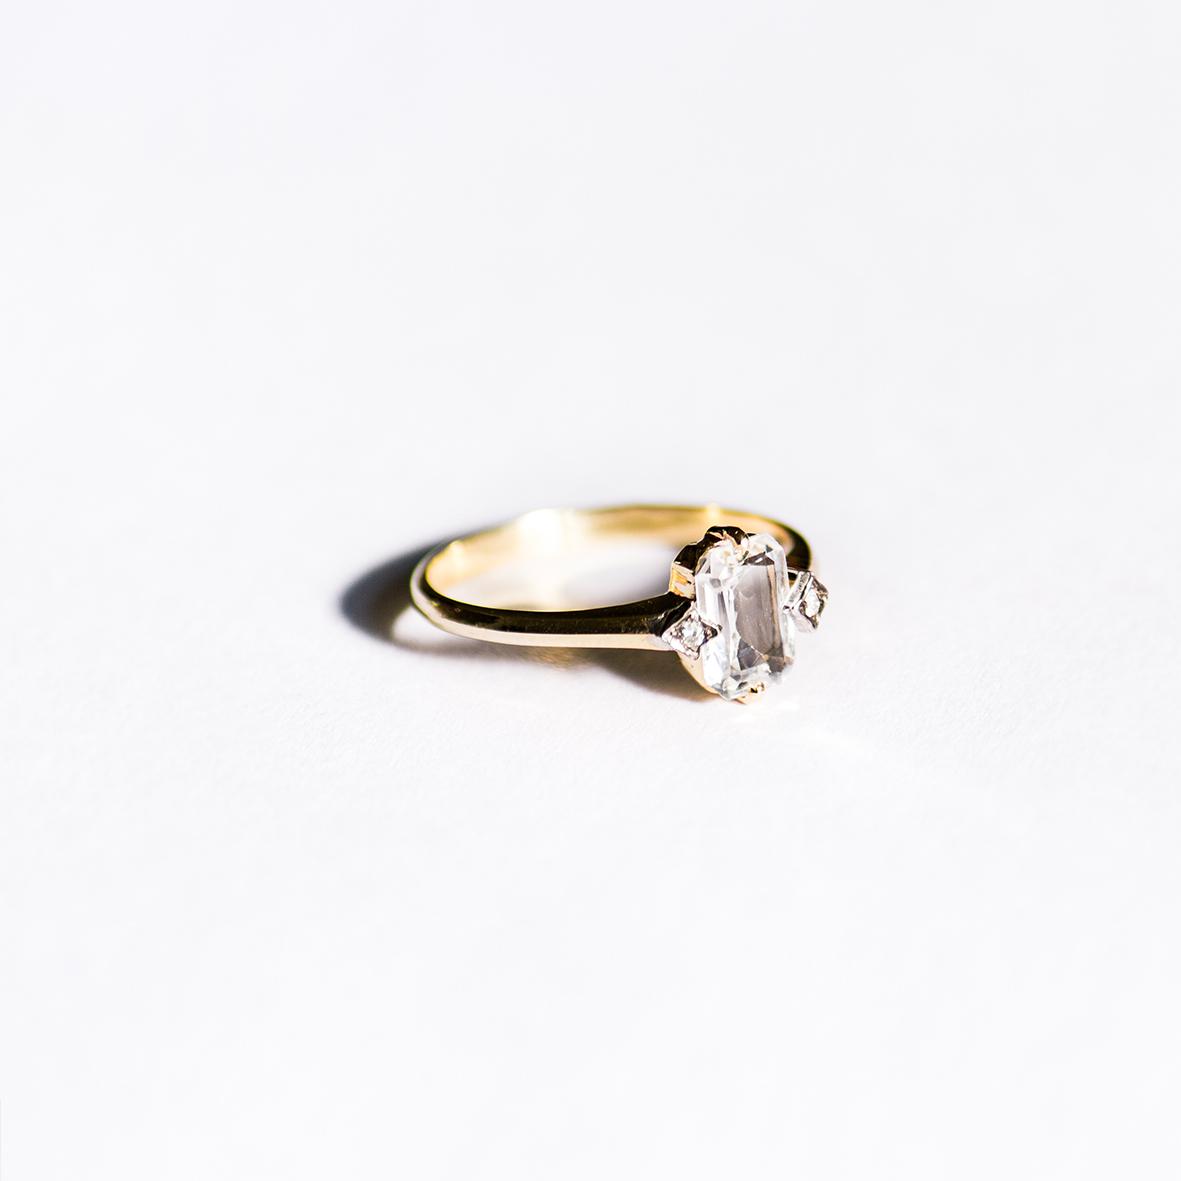 2. OONA_engagement_ficha1_single sapphire ring 2 copia